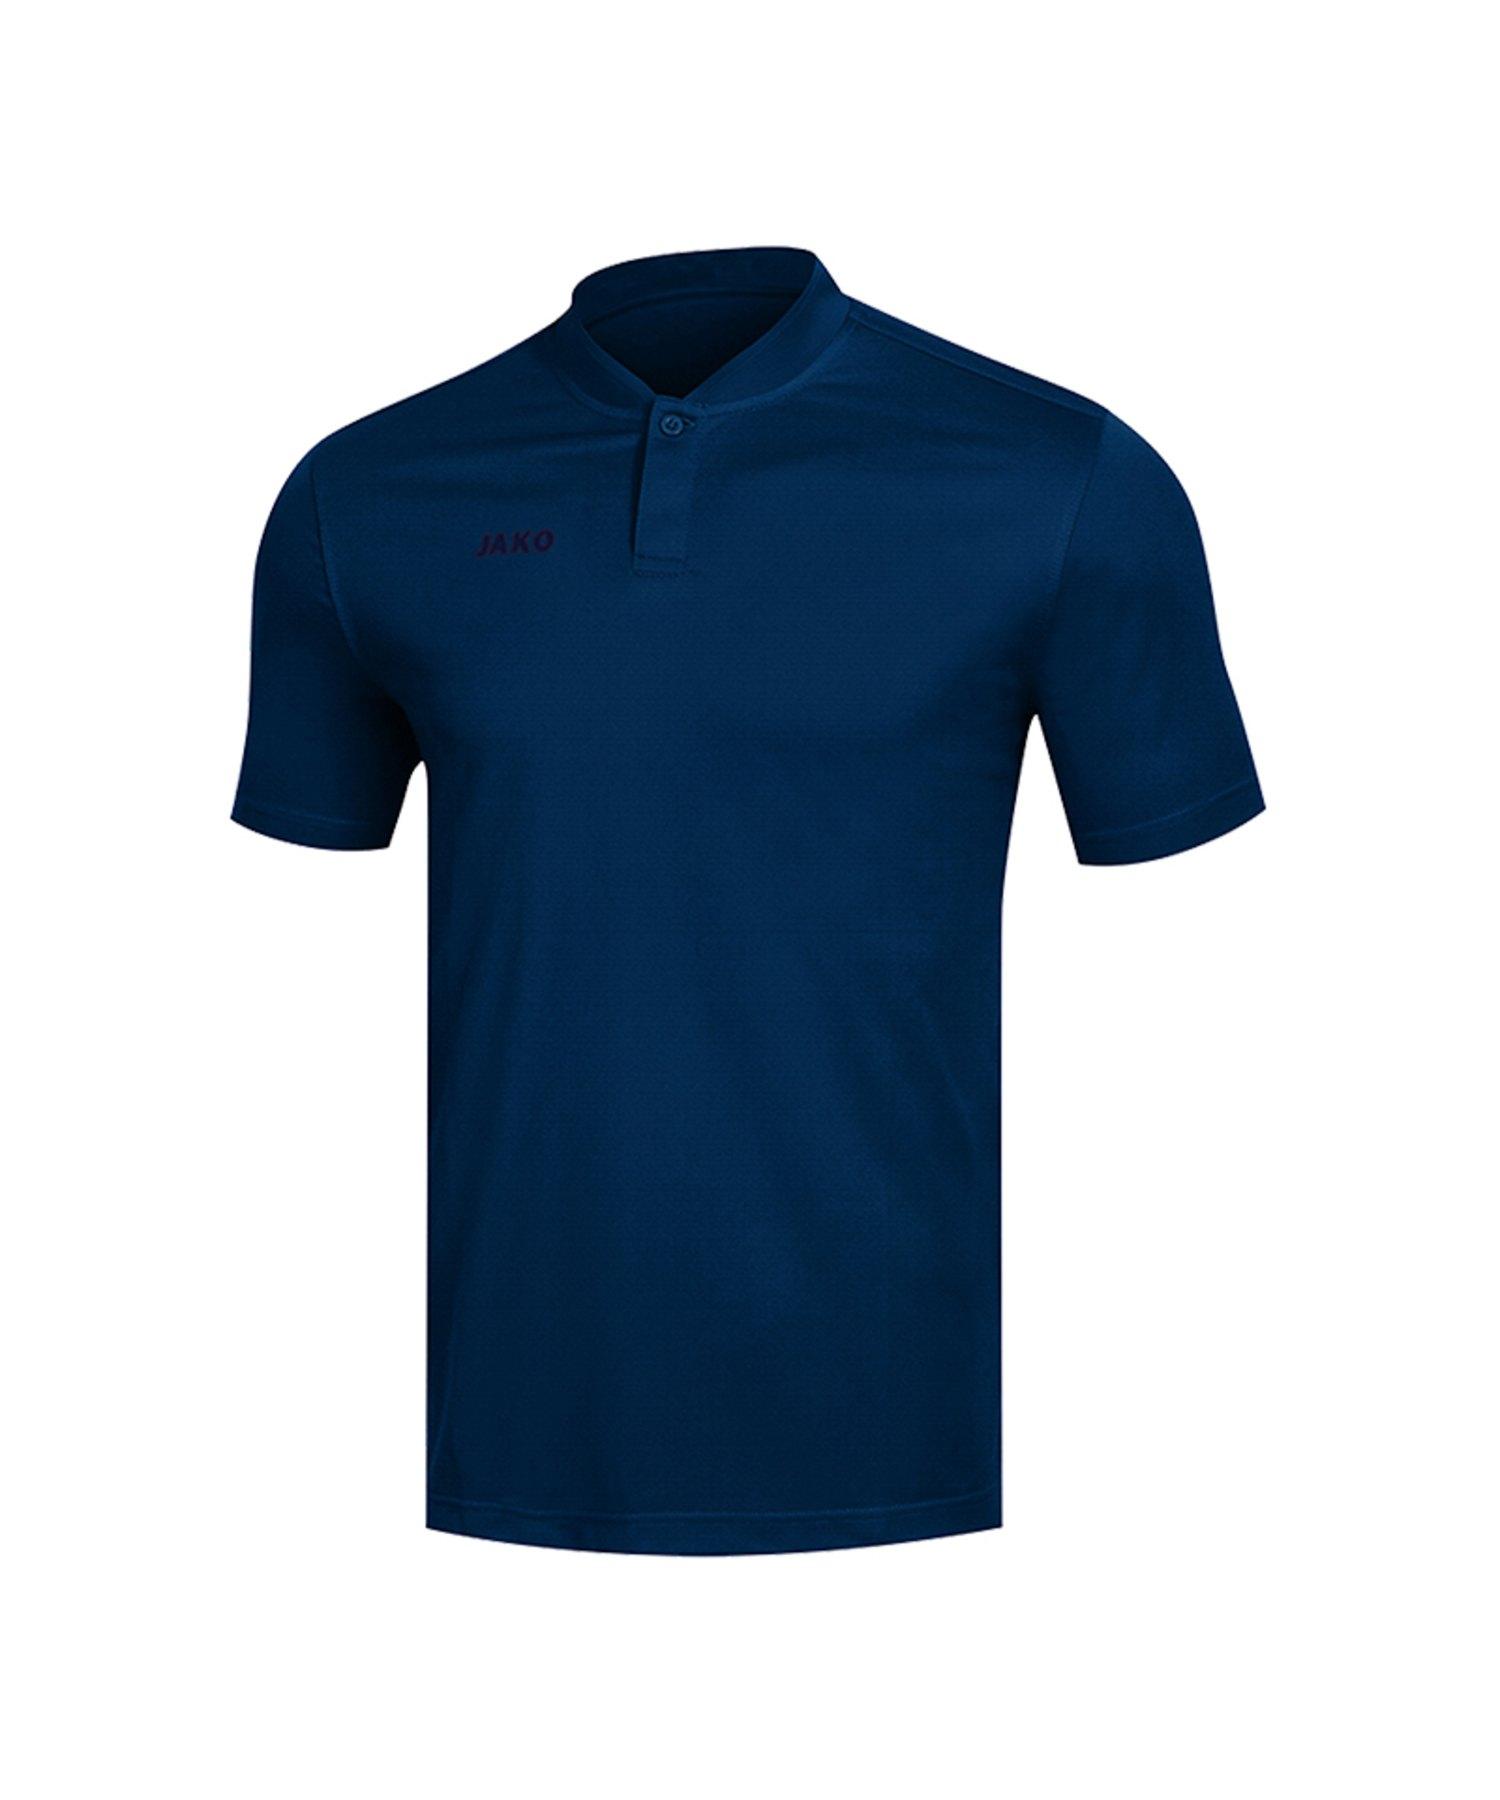 best service b7865 abd5c Jako Prestige Poloshirt Blau F49